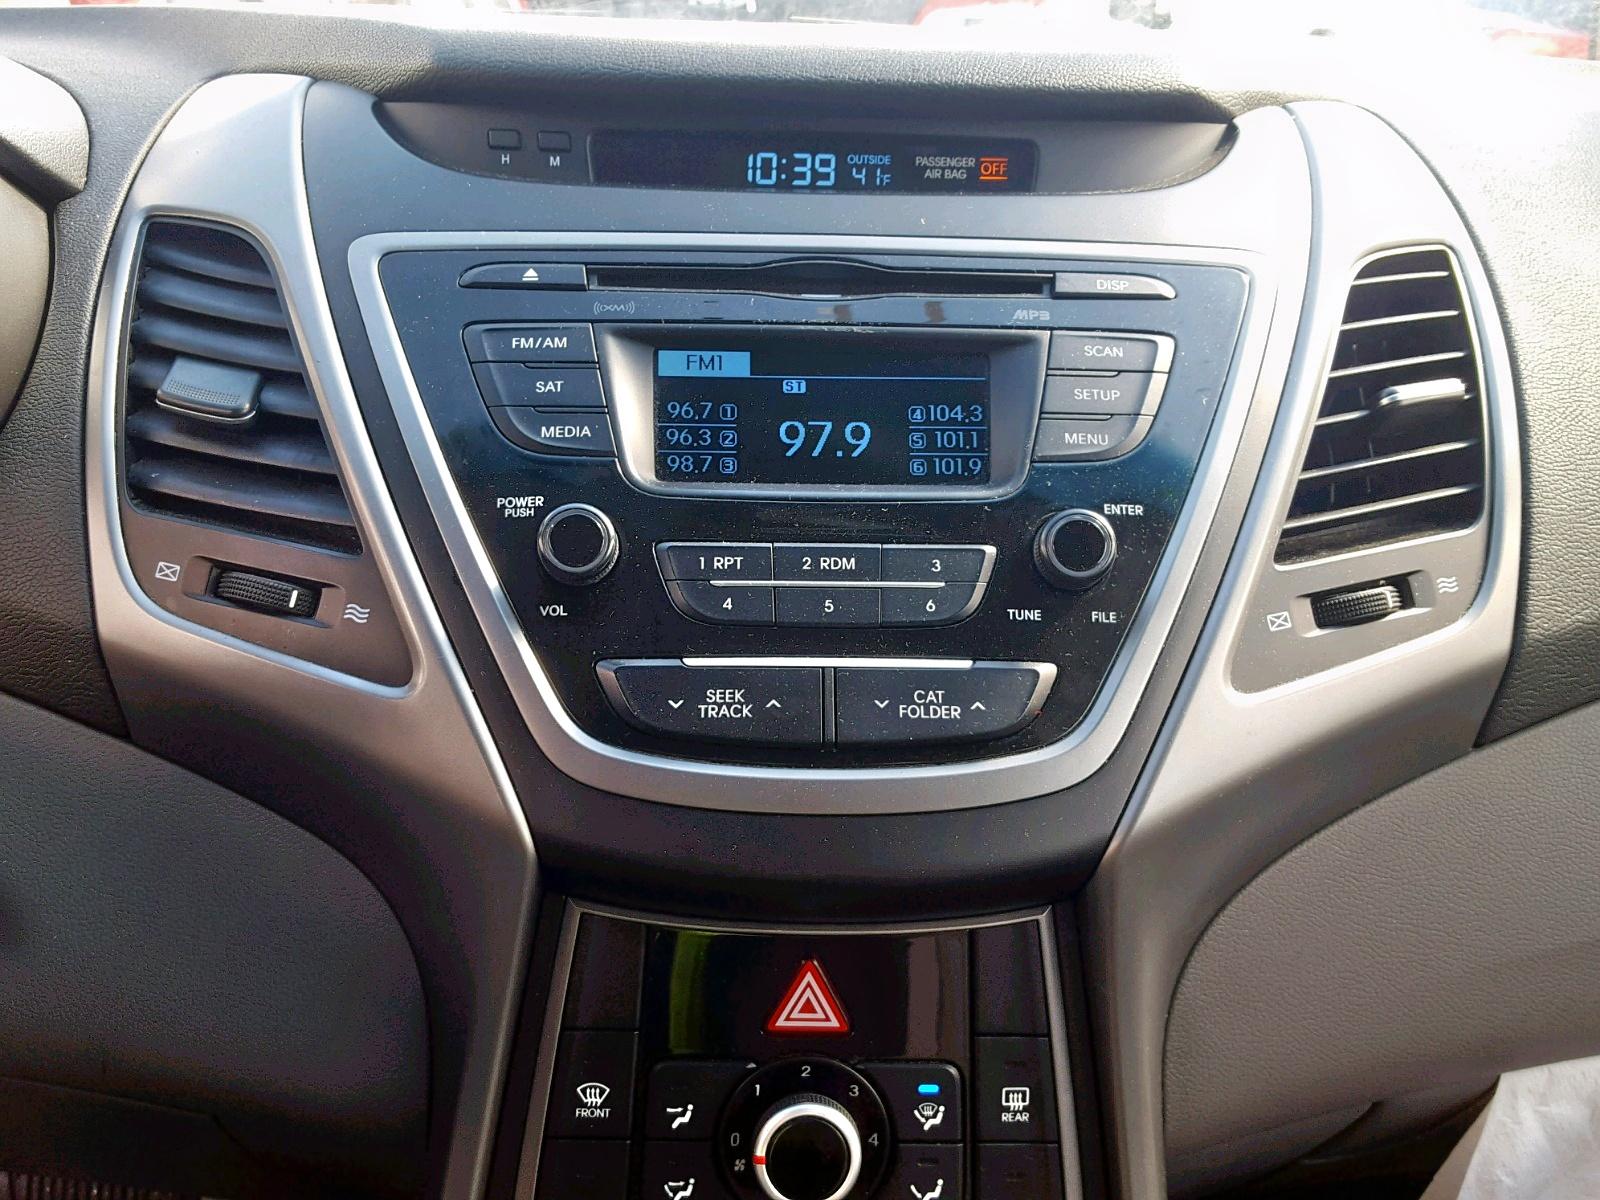 2015 Hyundai Elantra Se 1.8L engine view